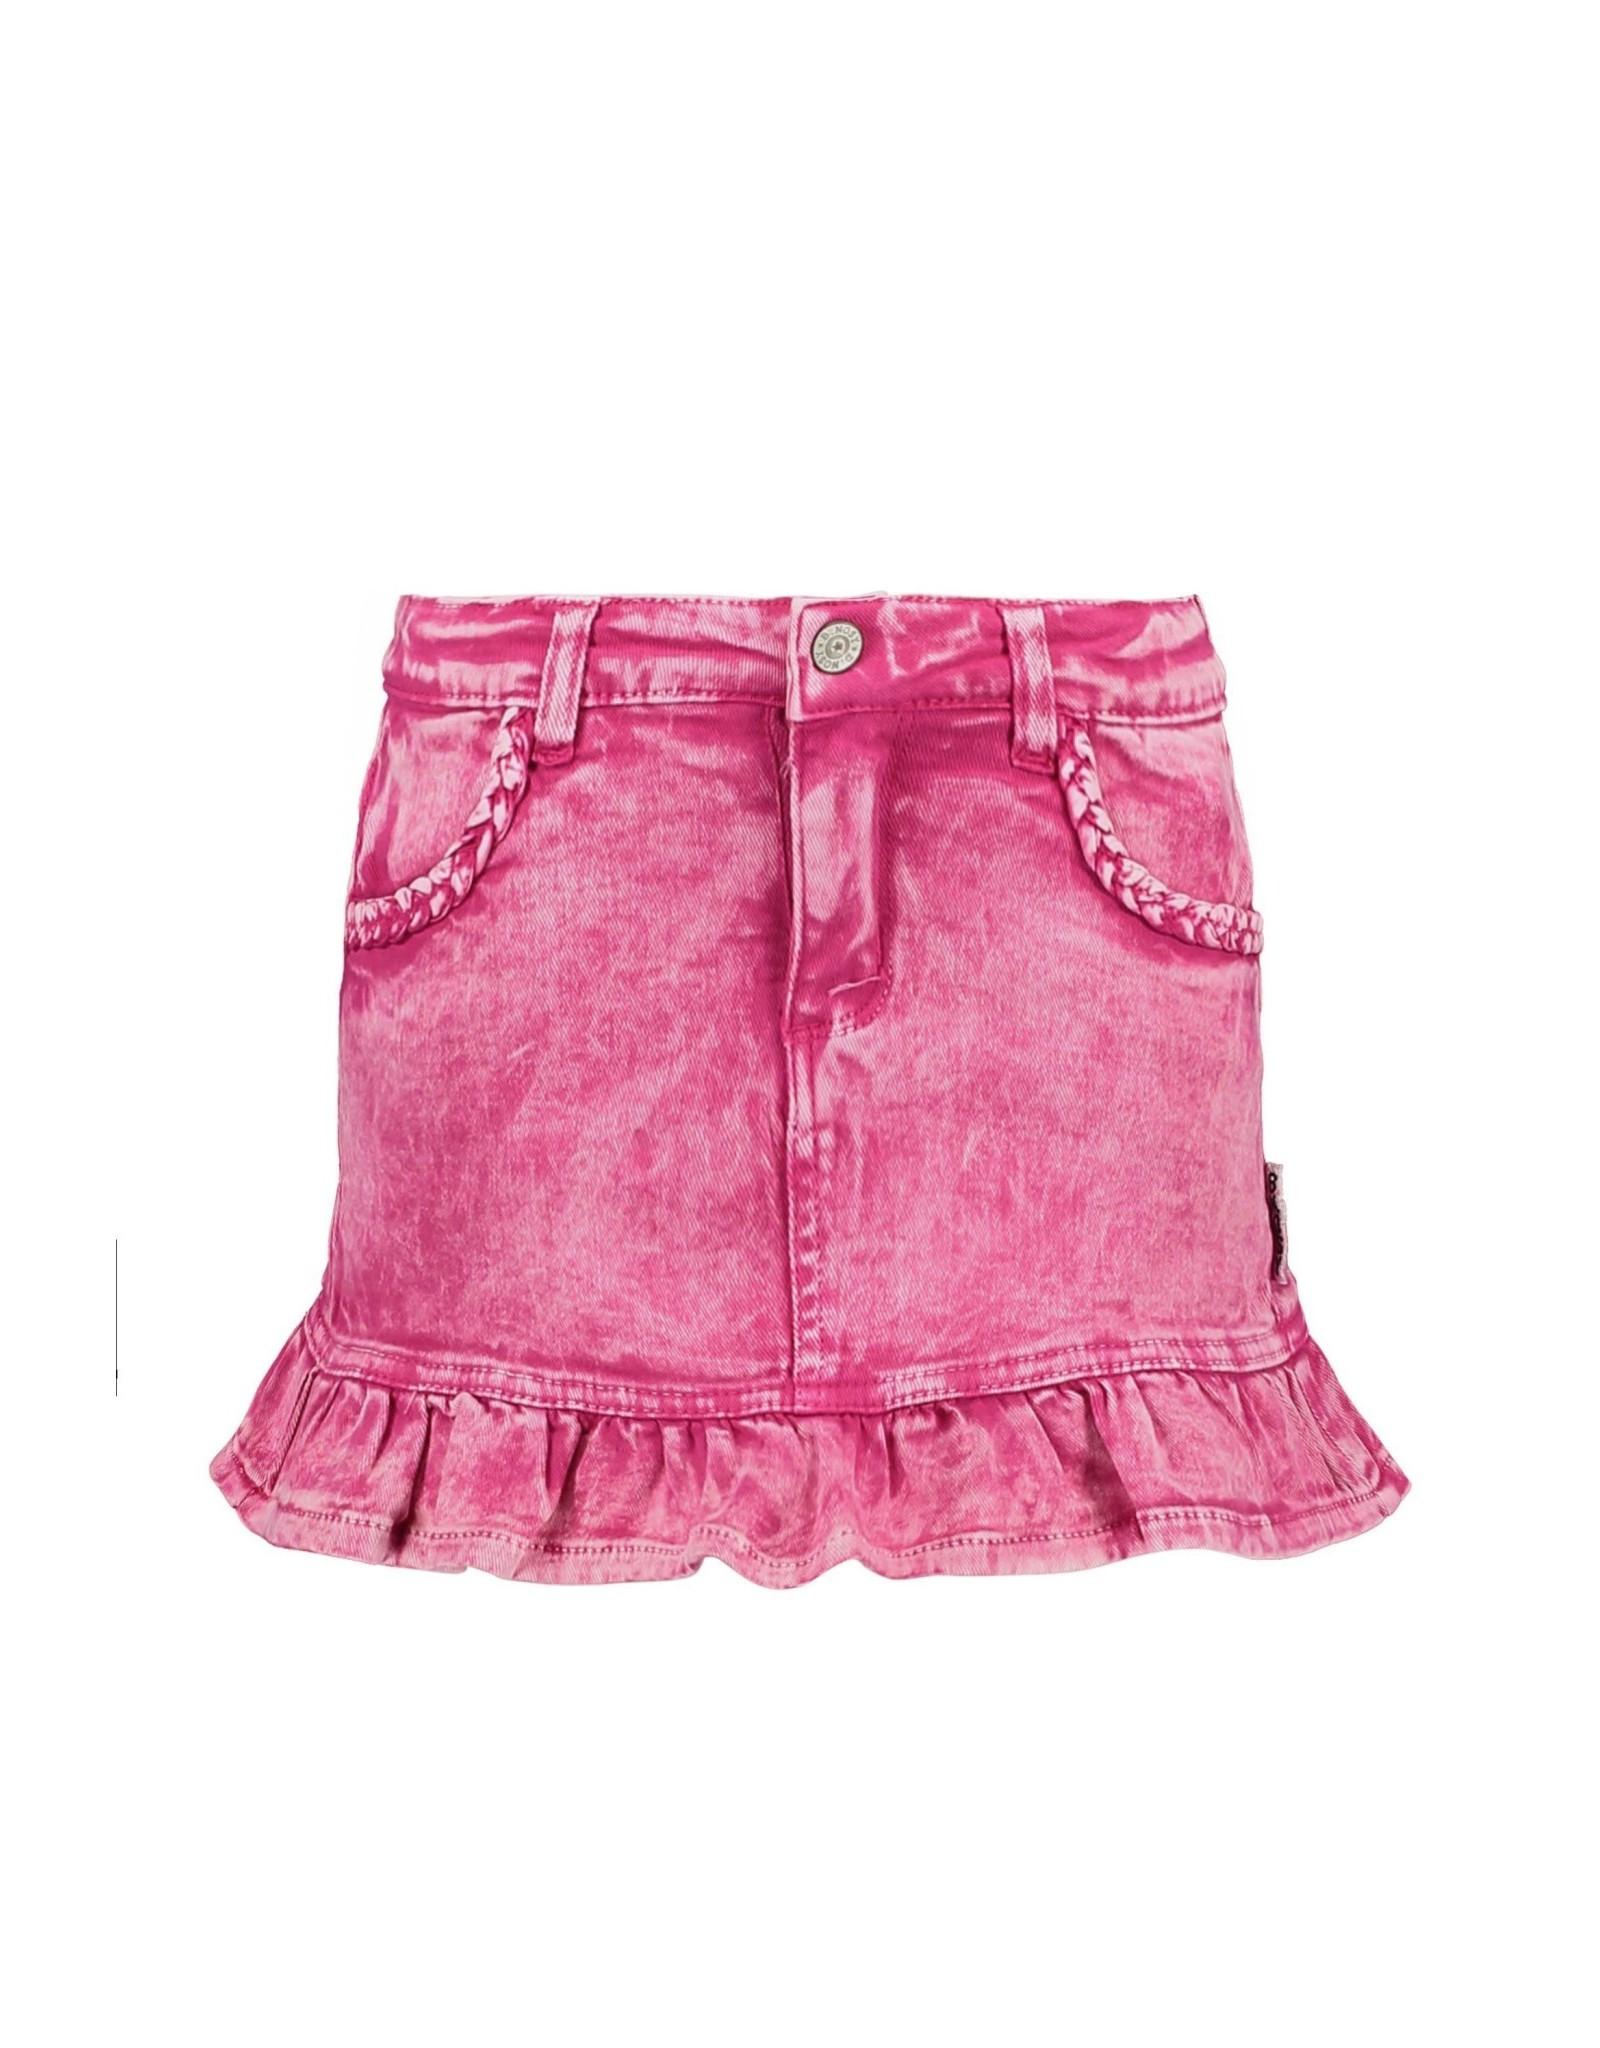 B.Nosy B.Nosy meisjes jeans rok Good Pink Denim